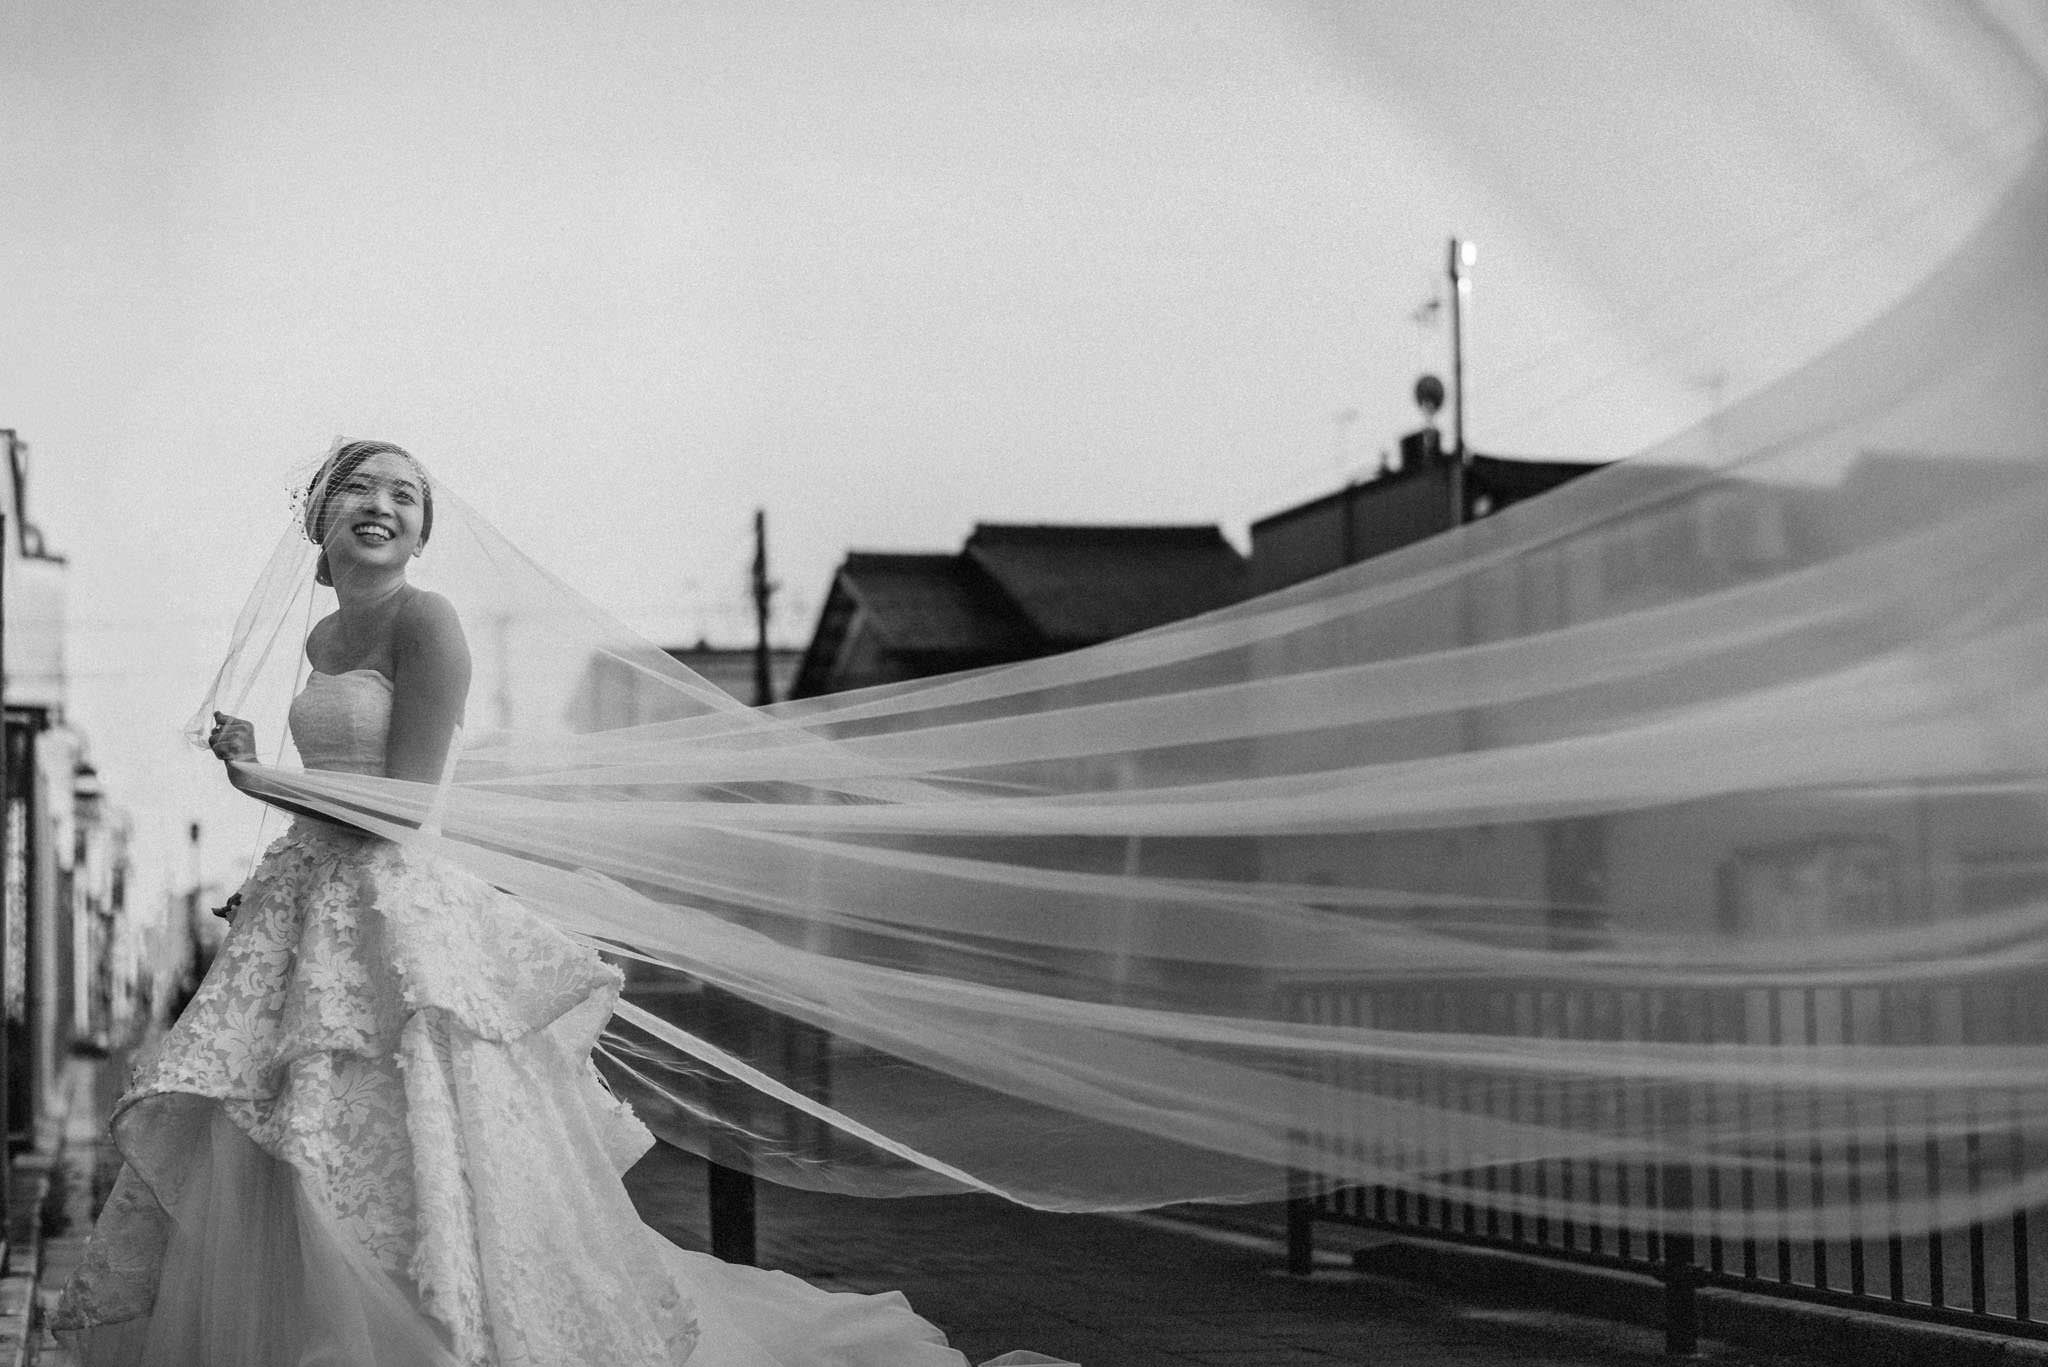 japan-wedding-photography-by-roberto-panciatici-photography-59